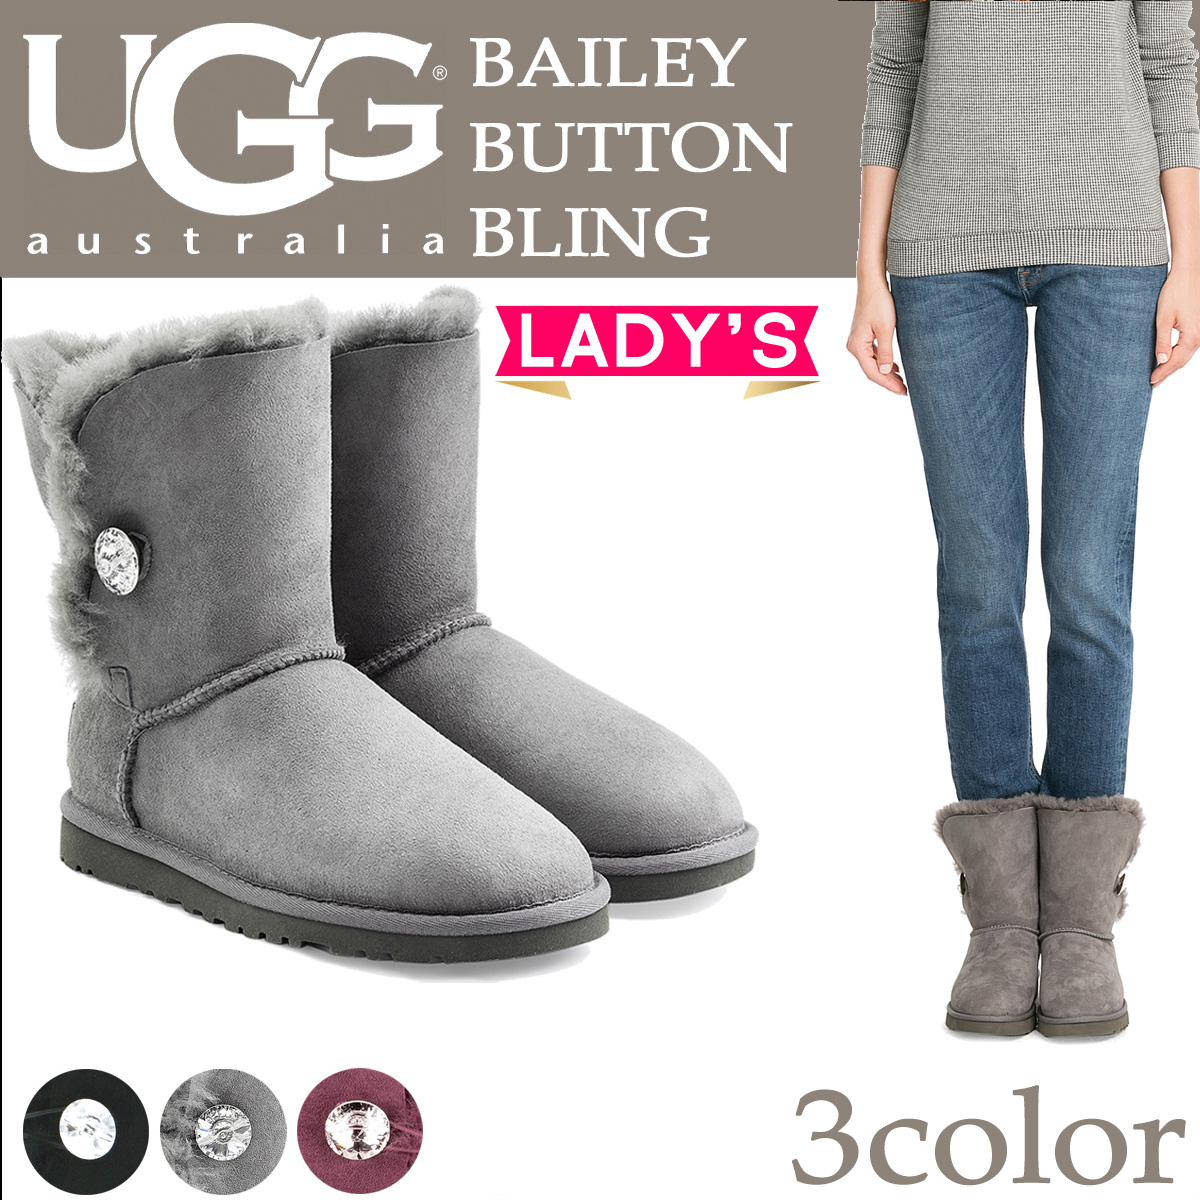 Ugg Bailey Button Bling